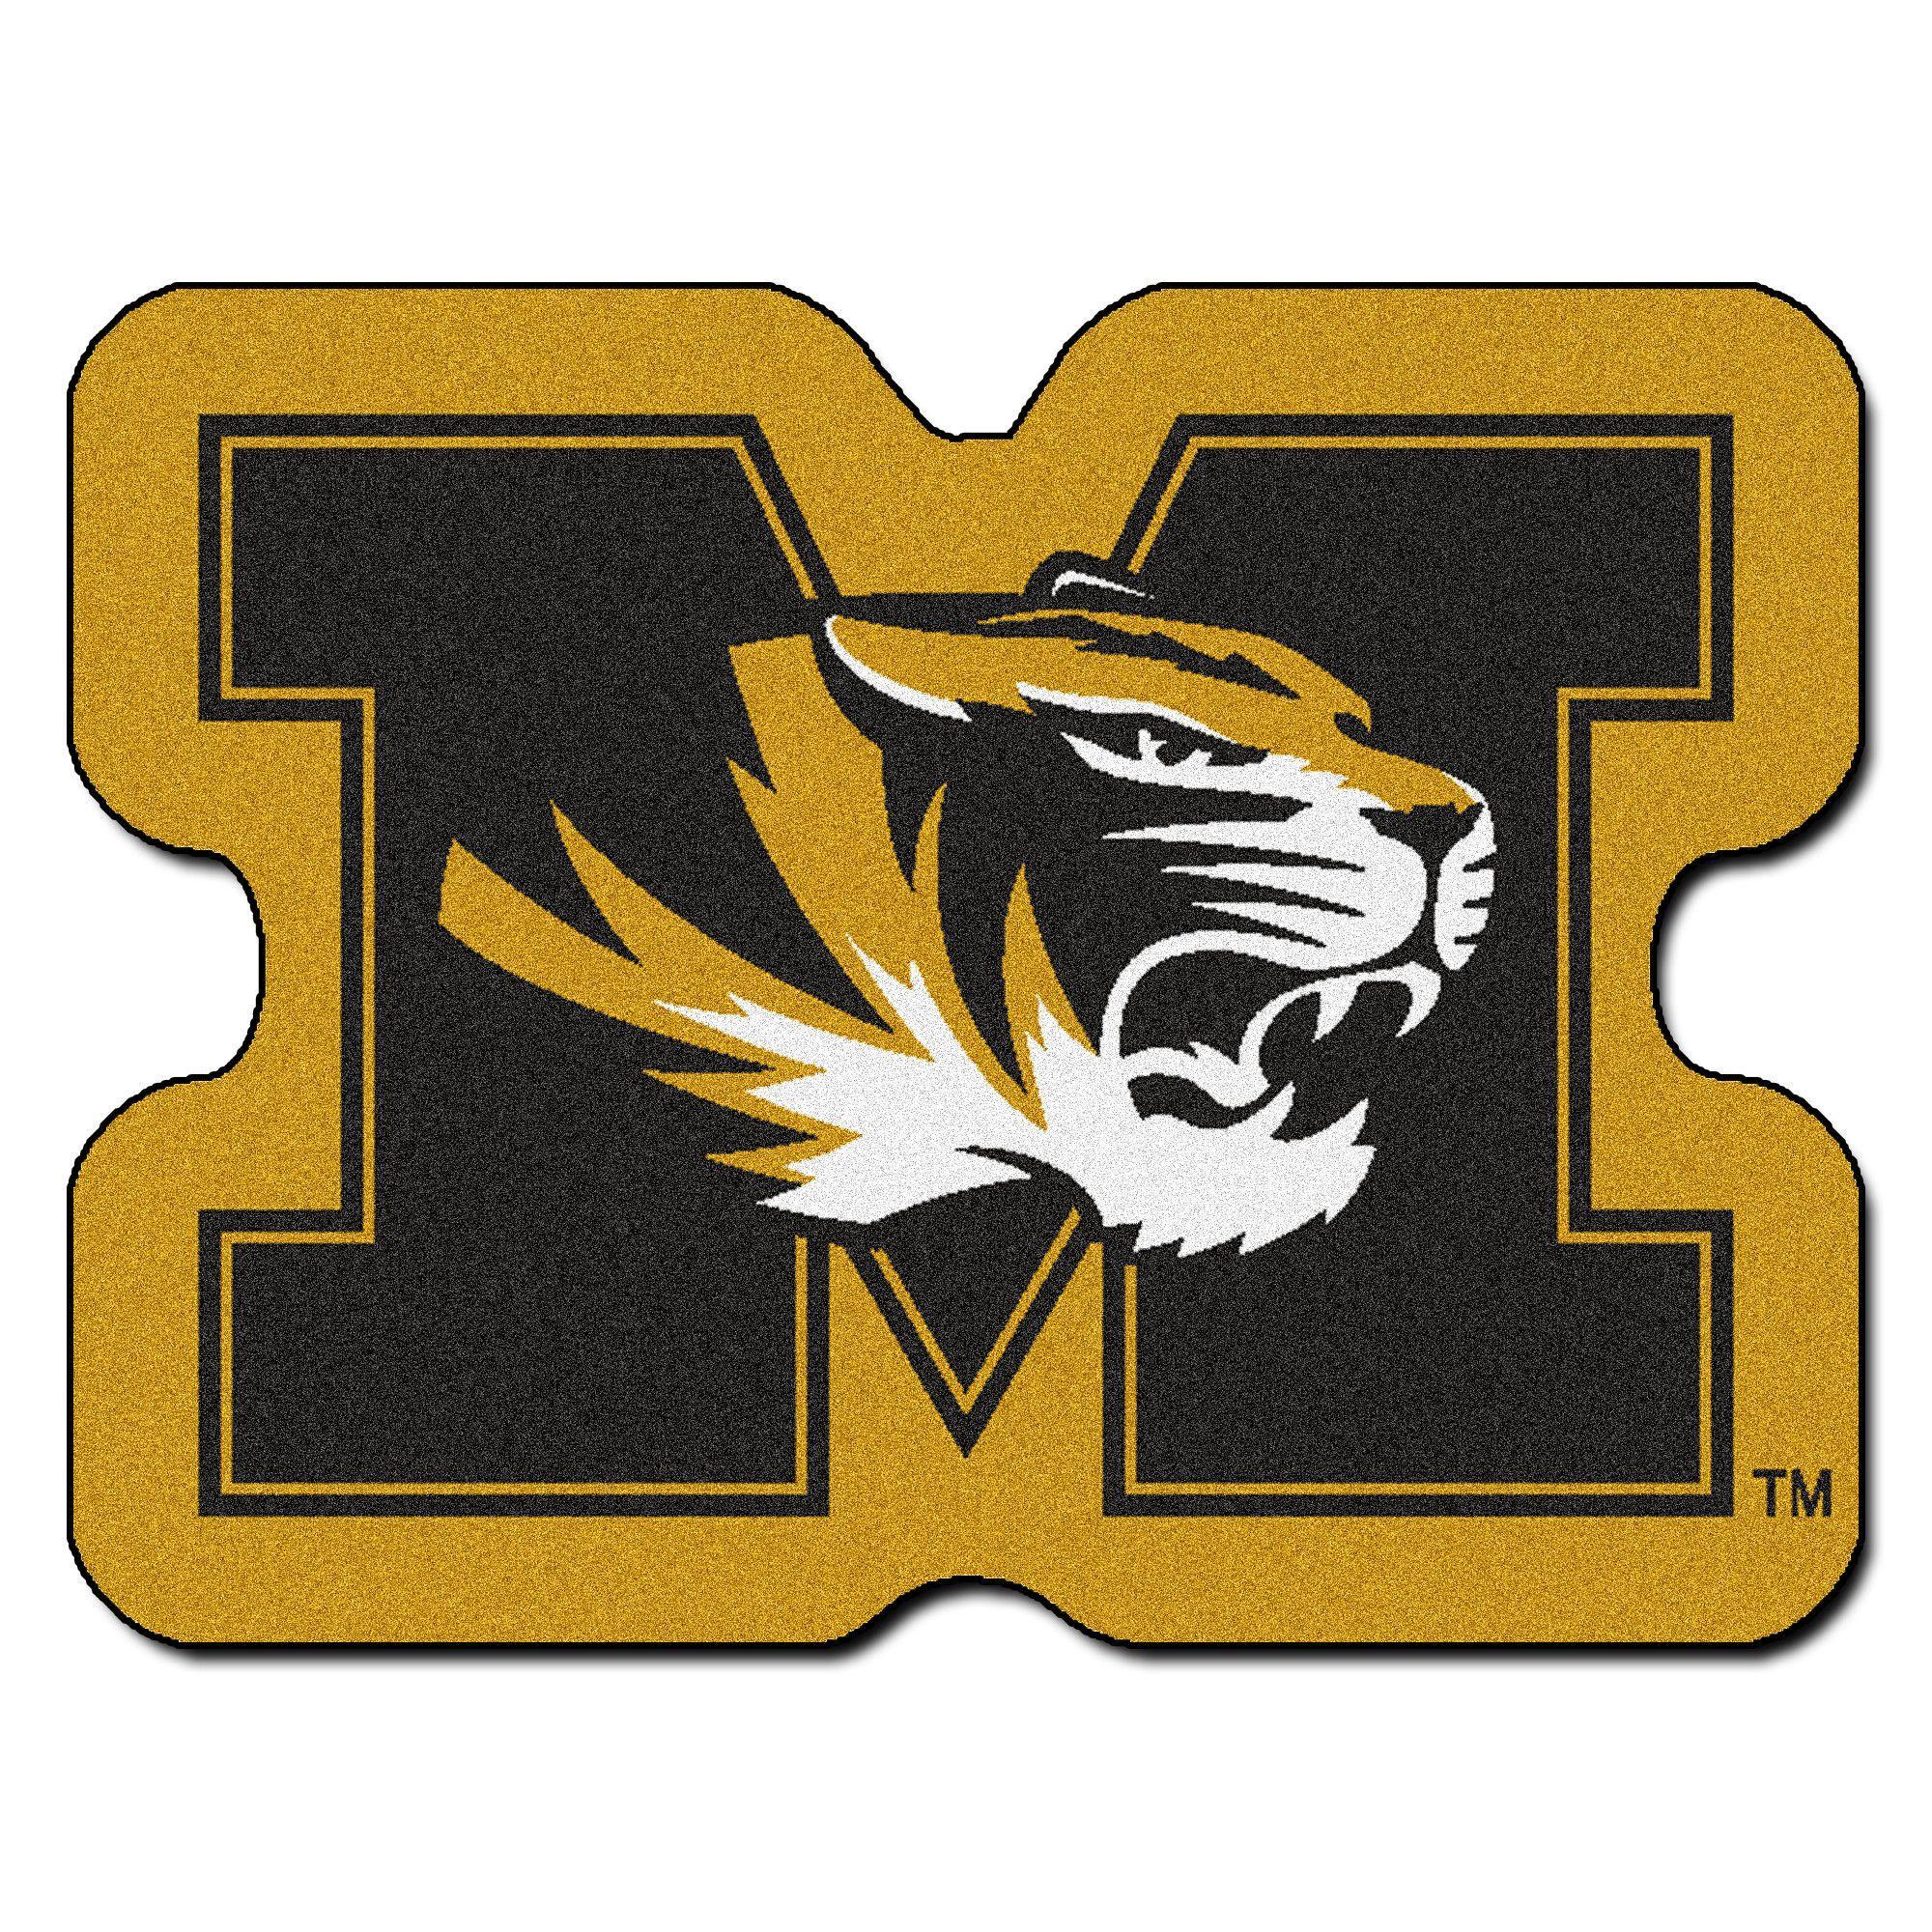 Ncaa University Of Missouri Mascot 40 In X 30 In Non Slip Indoor Only Mat Missouri Tigers Logo Missouri Tigers Mizzou Tigers